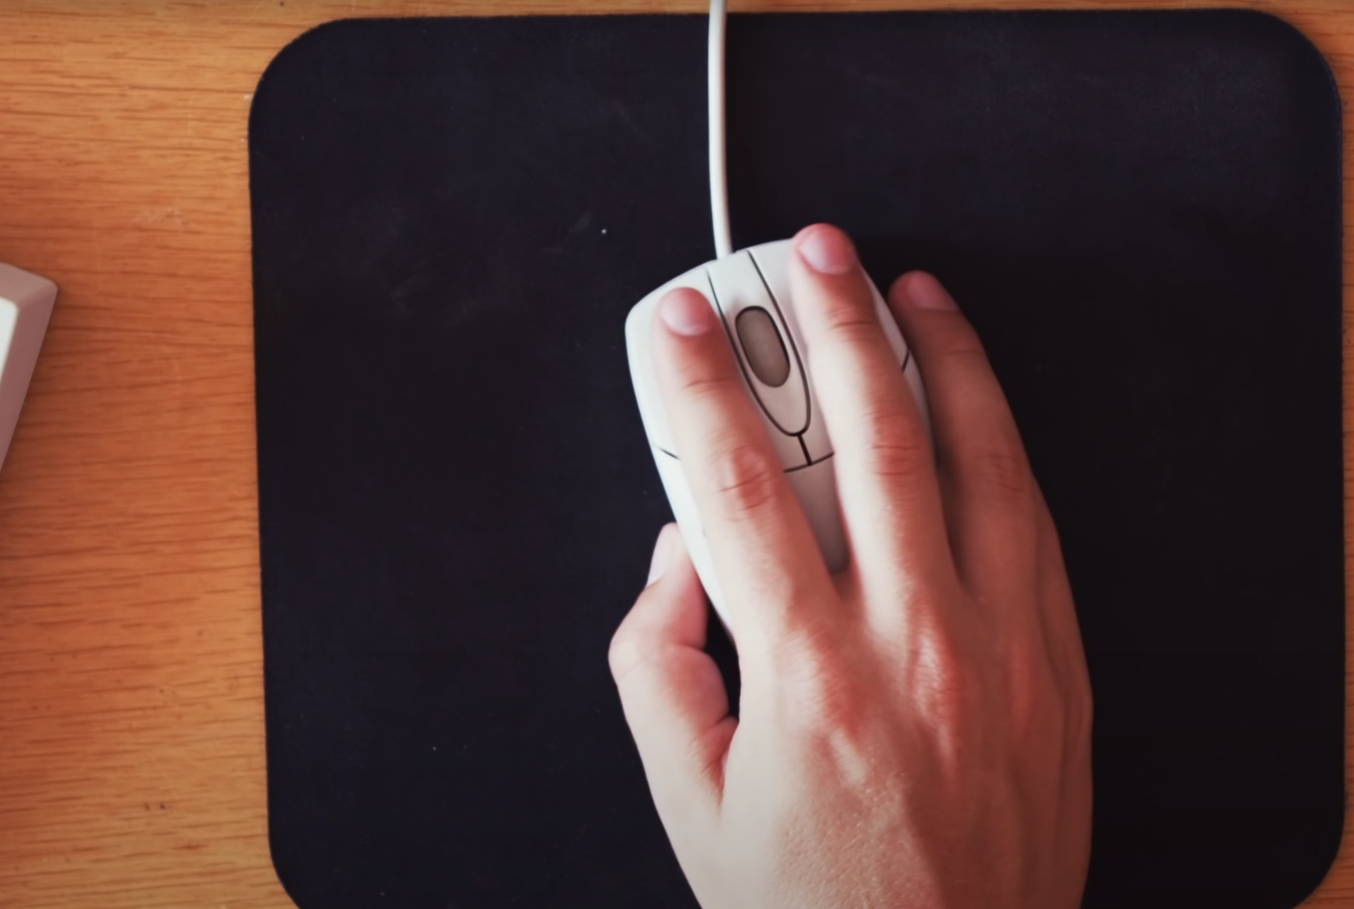 Hand using a trackball mouse on a plain cloth mousepad